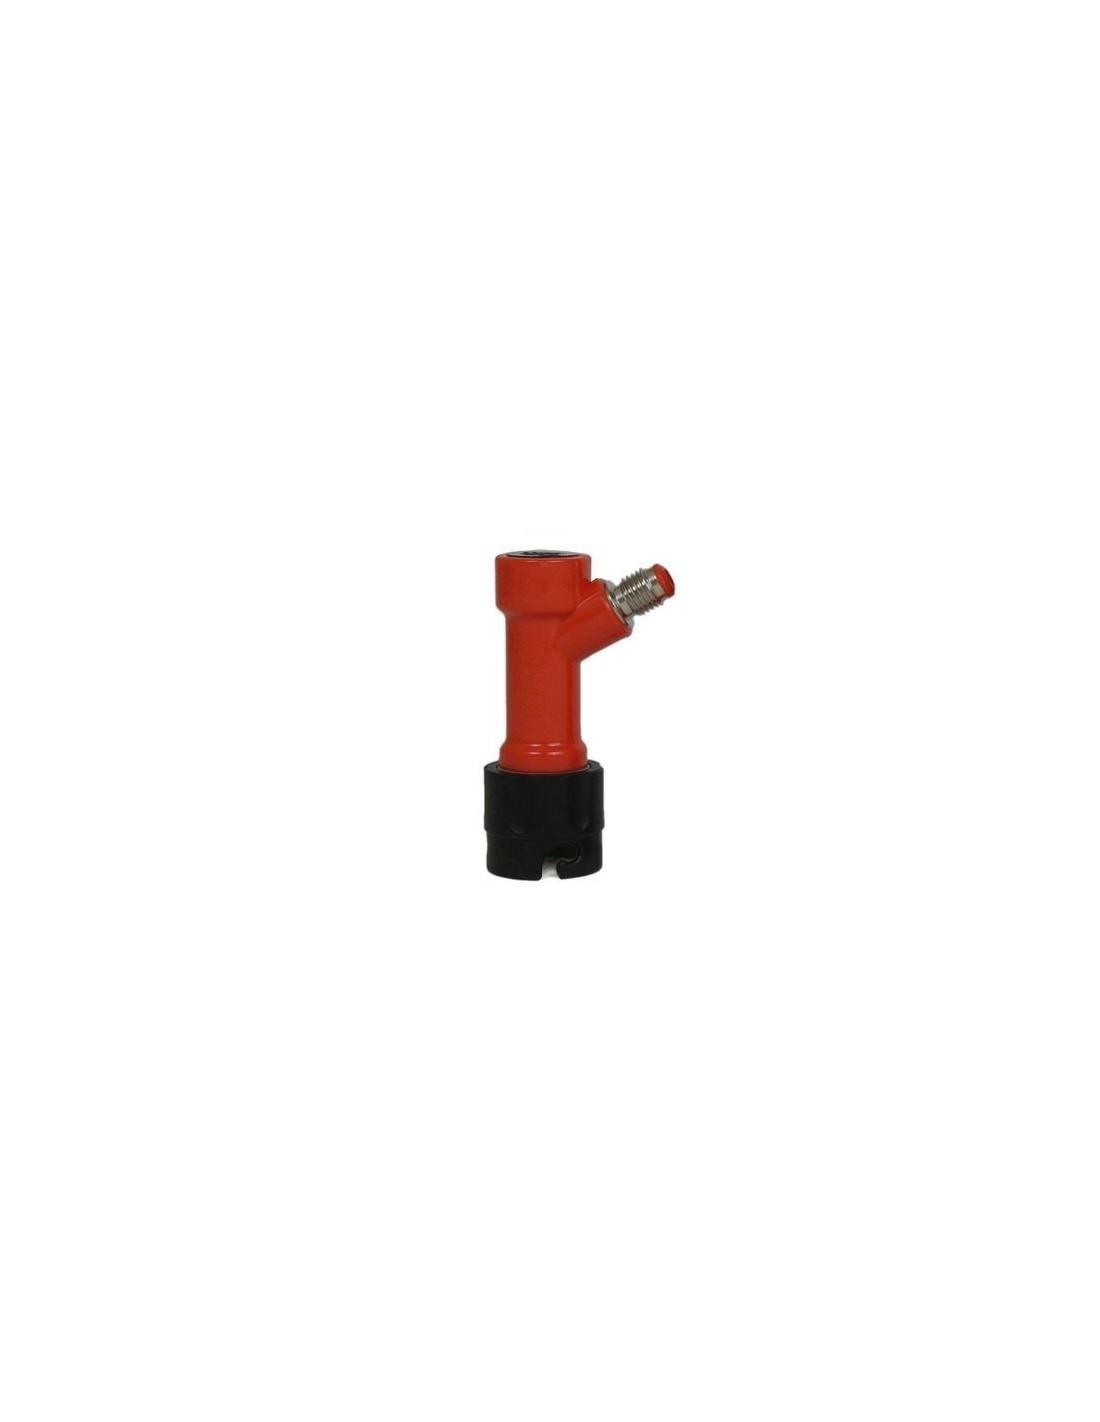 "UPP00025 - Pin lock beverage disconnect for Cornelius kegs with 7/16"" thread"